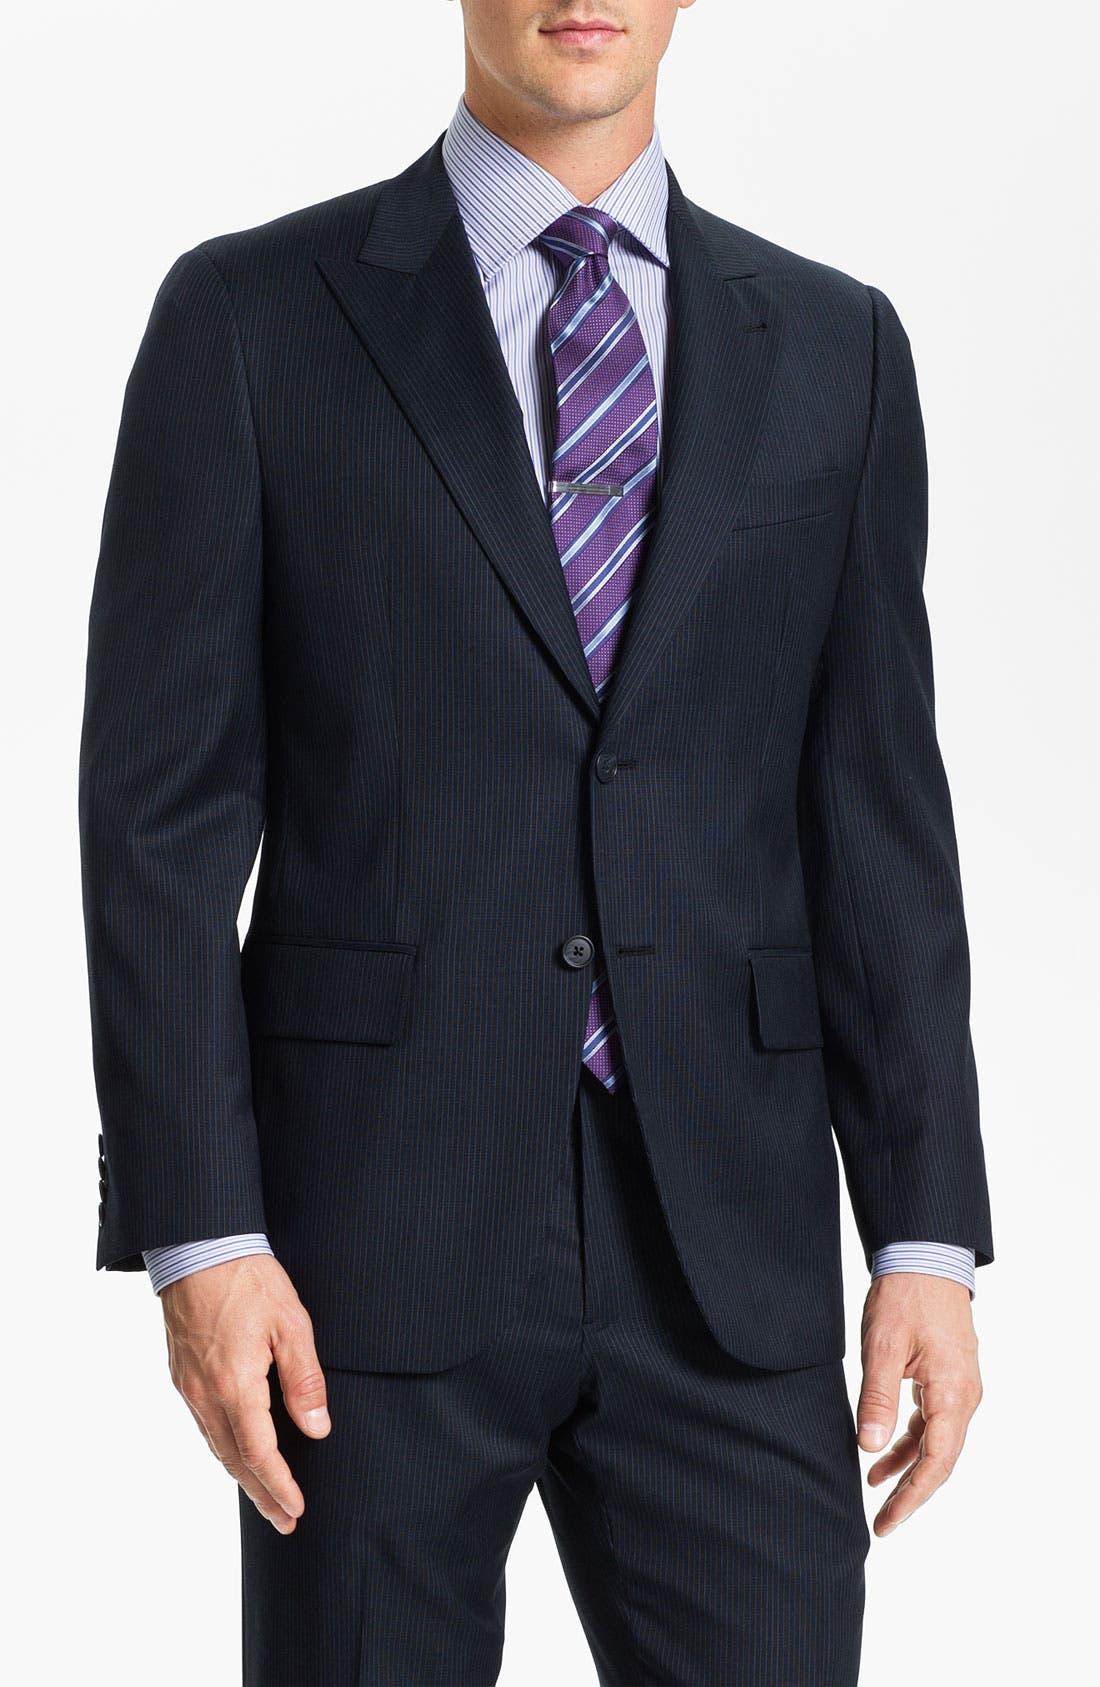 Alternate Image 1 Selected - Joseph Abboud Trim Fit Peak Lapel Stripe Suit